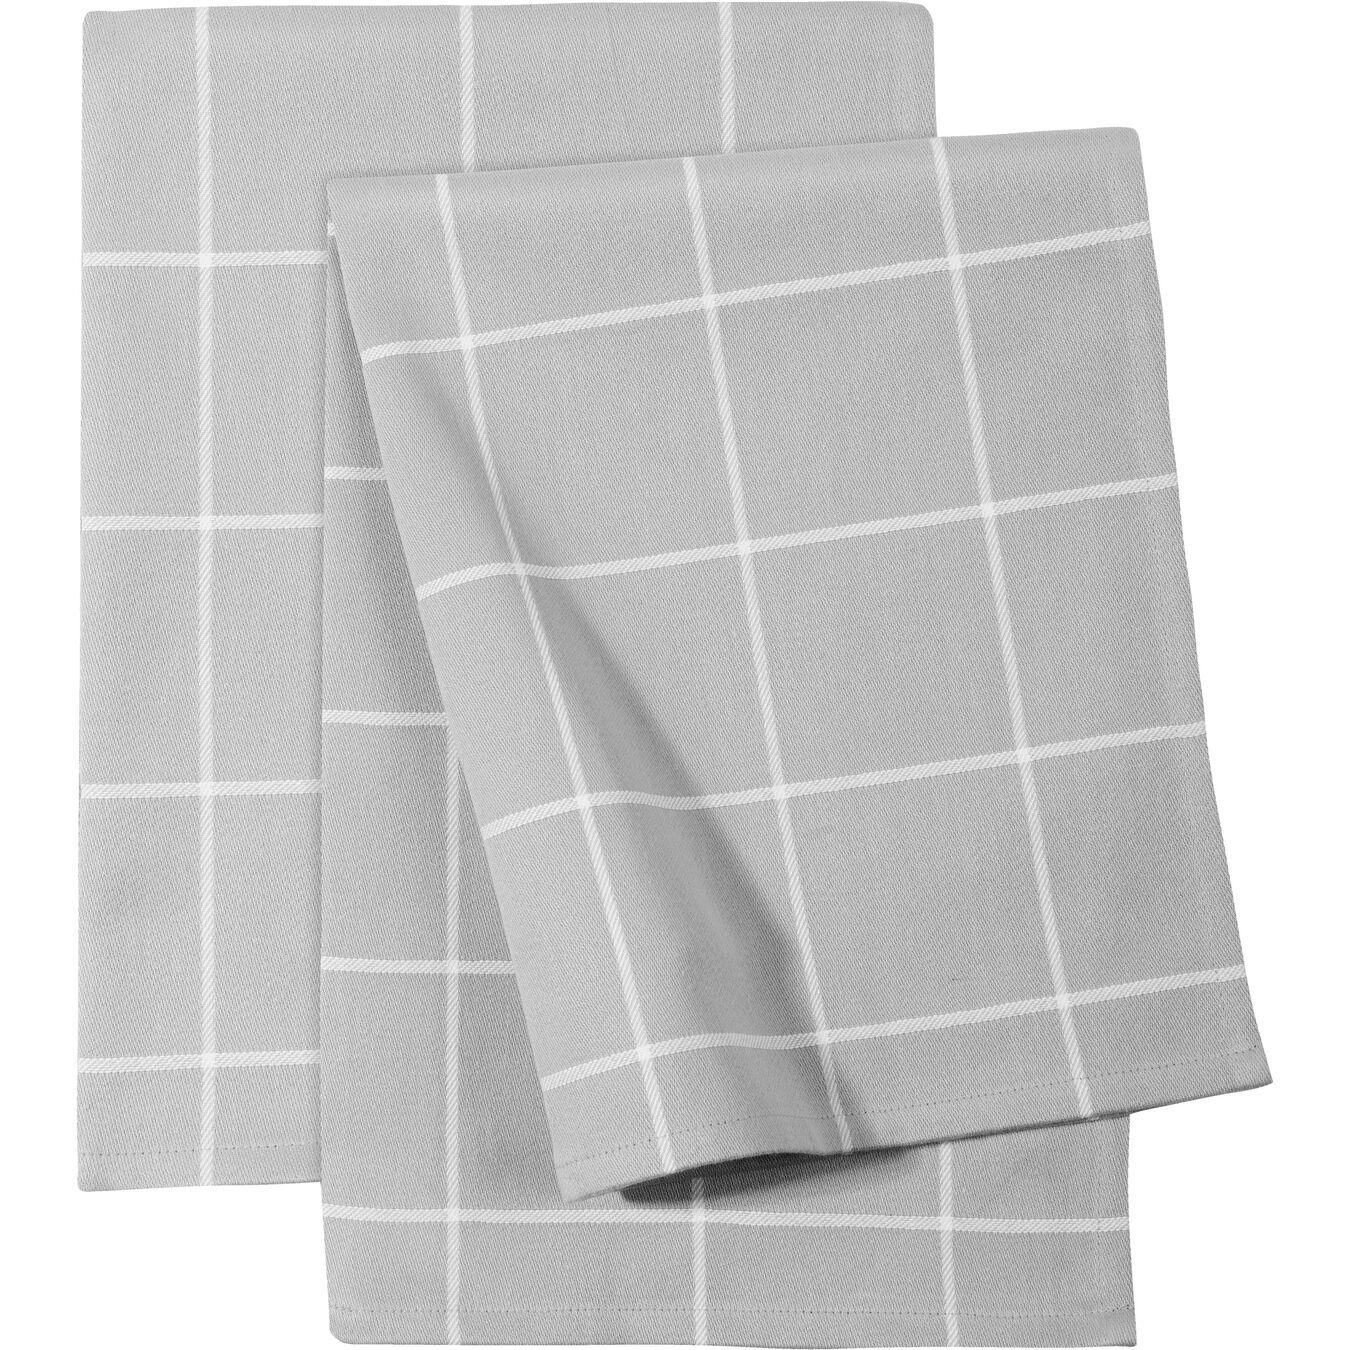 2 Piece 2 Piece Kitchen towel set checkered, grey,,large 1